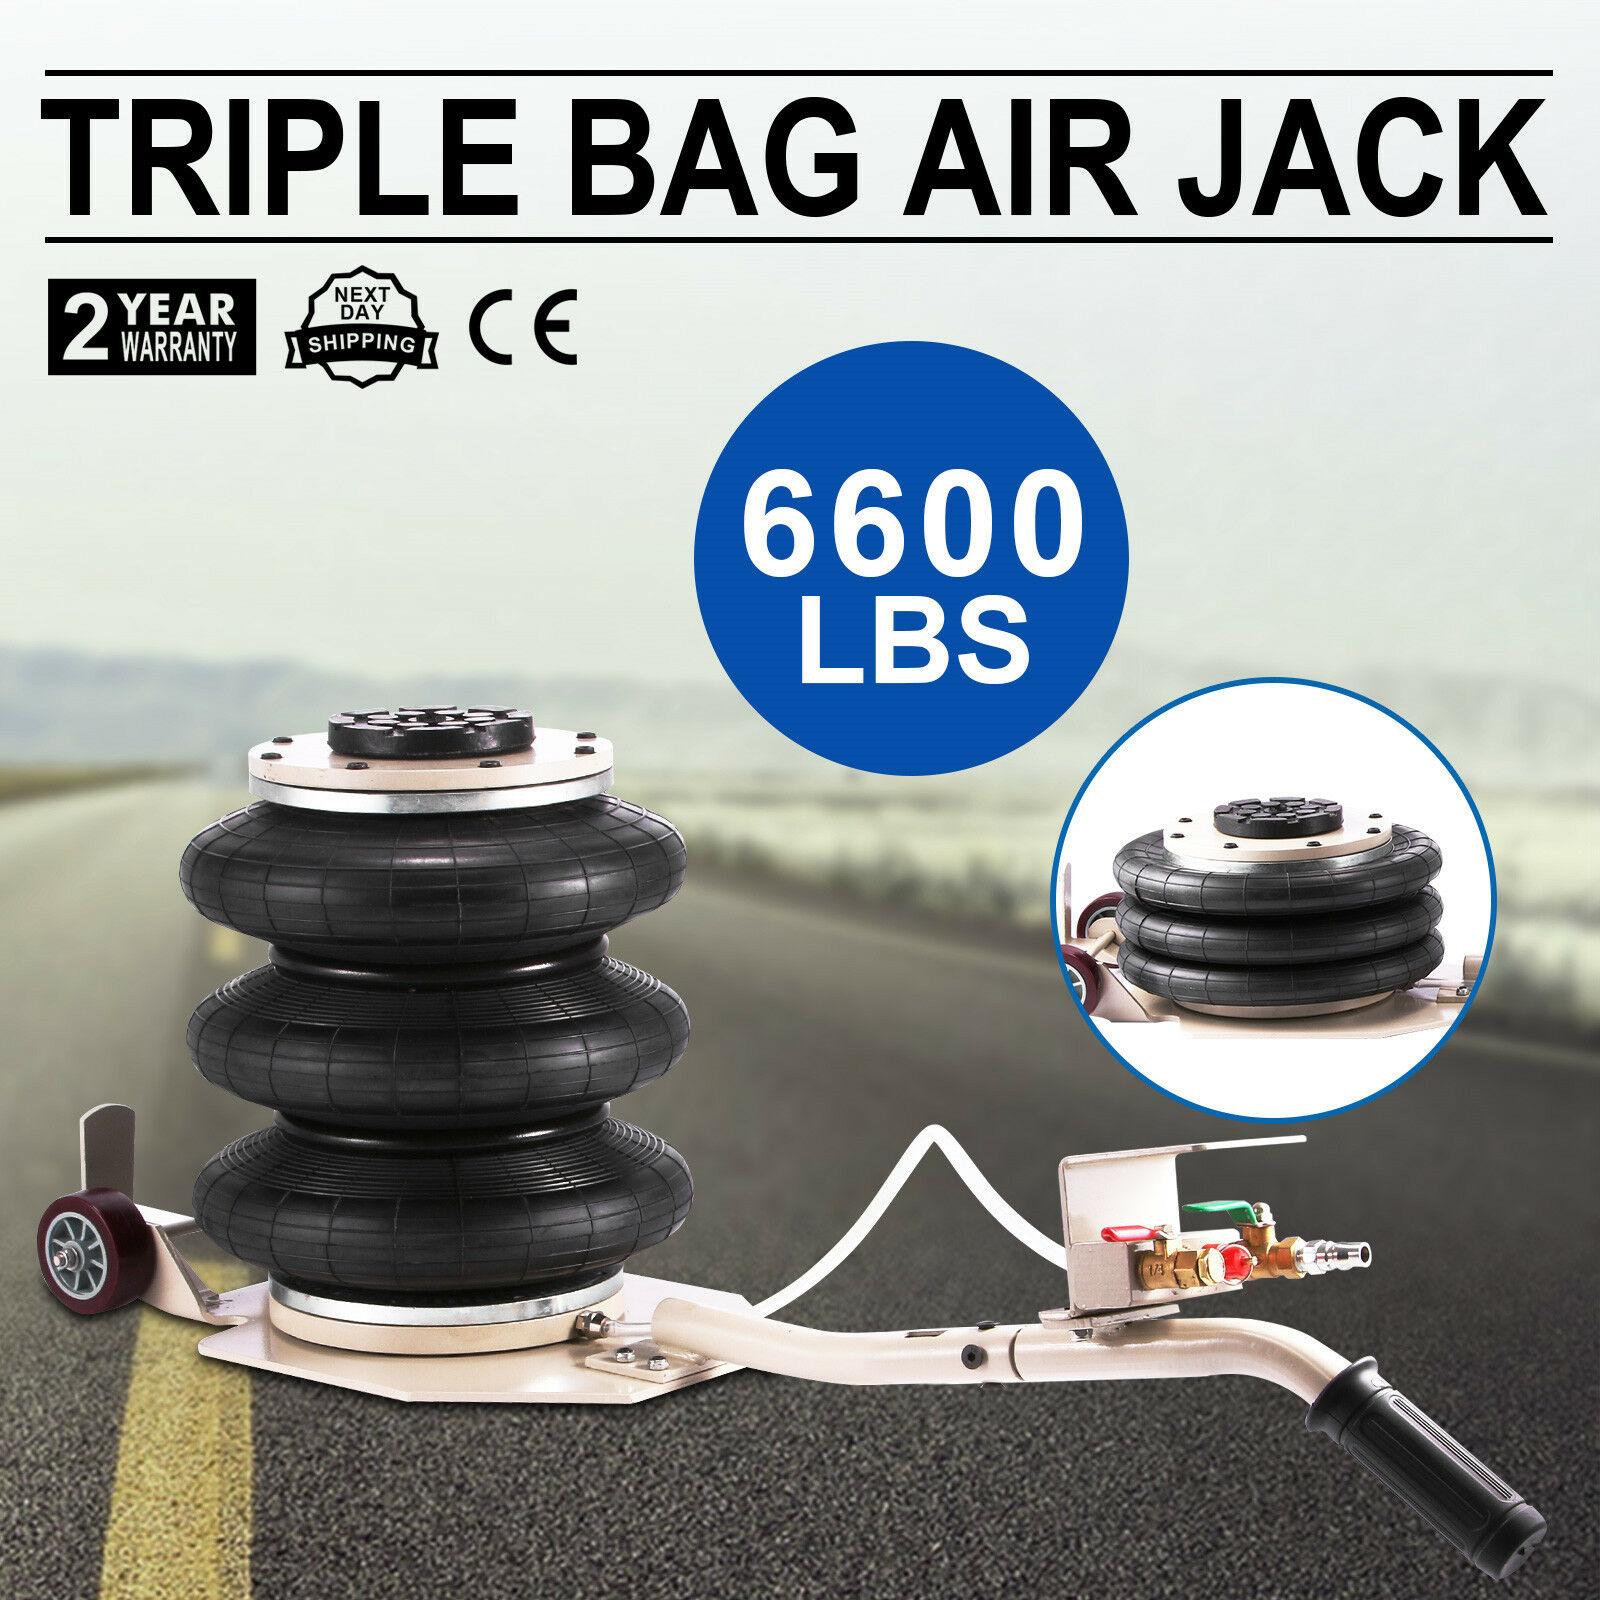 Triple Bag Air Jack Pneumatic Jack 6600LBS Quick Lift 3 Ton Heavy Duty Jacking 16 Inch Lifting Height Pneumatic Air Jack 6600LBS